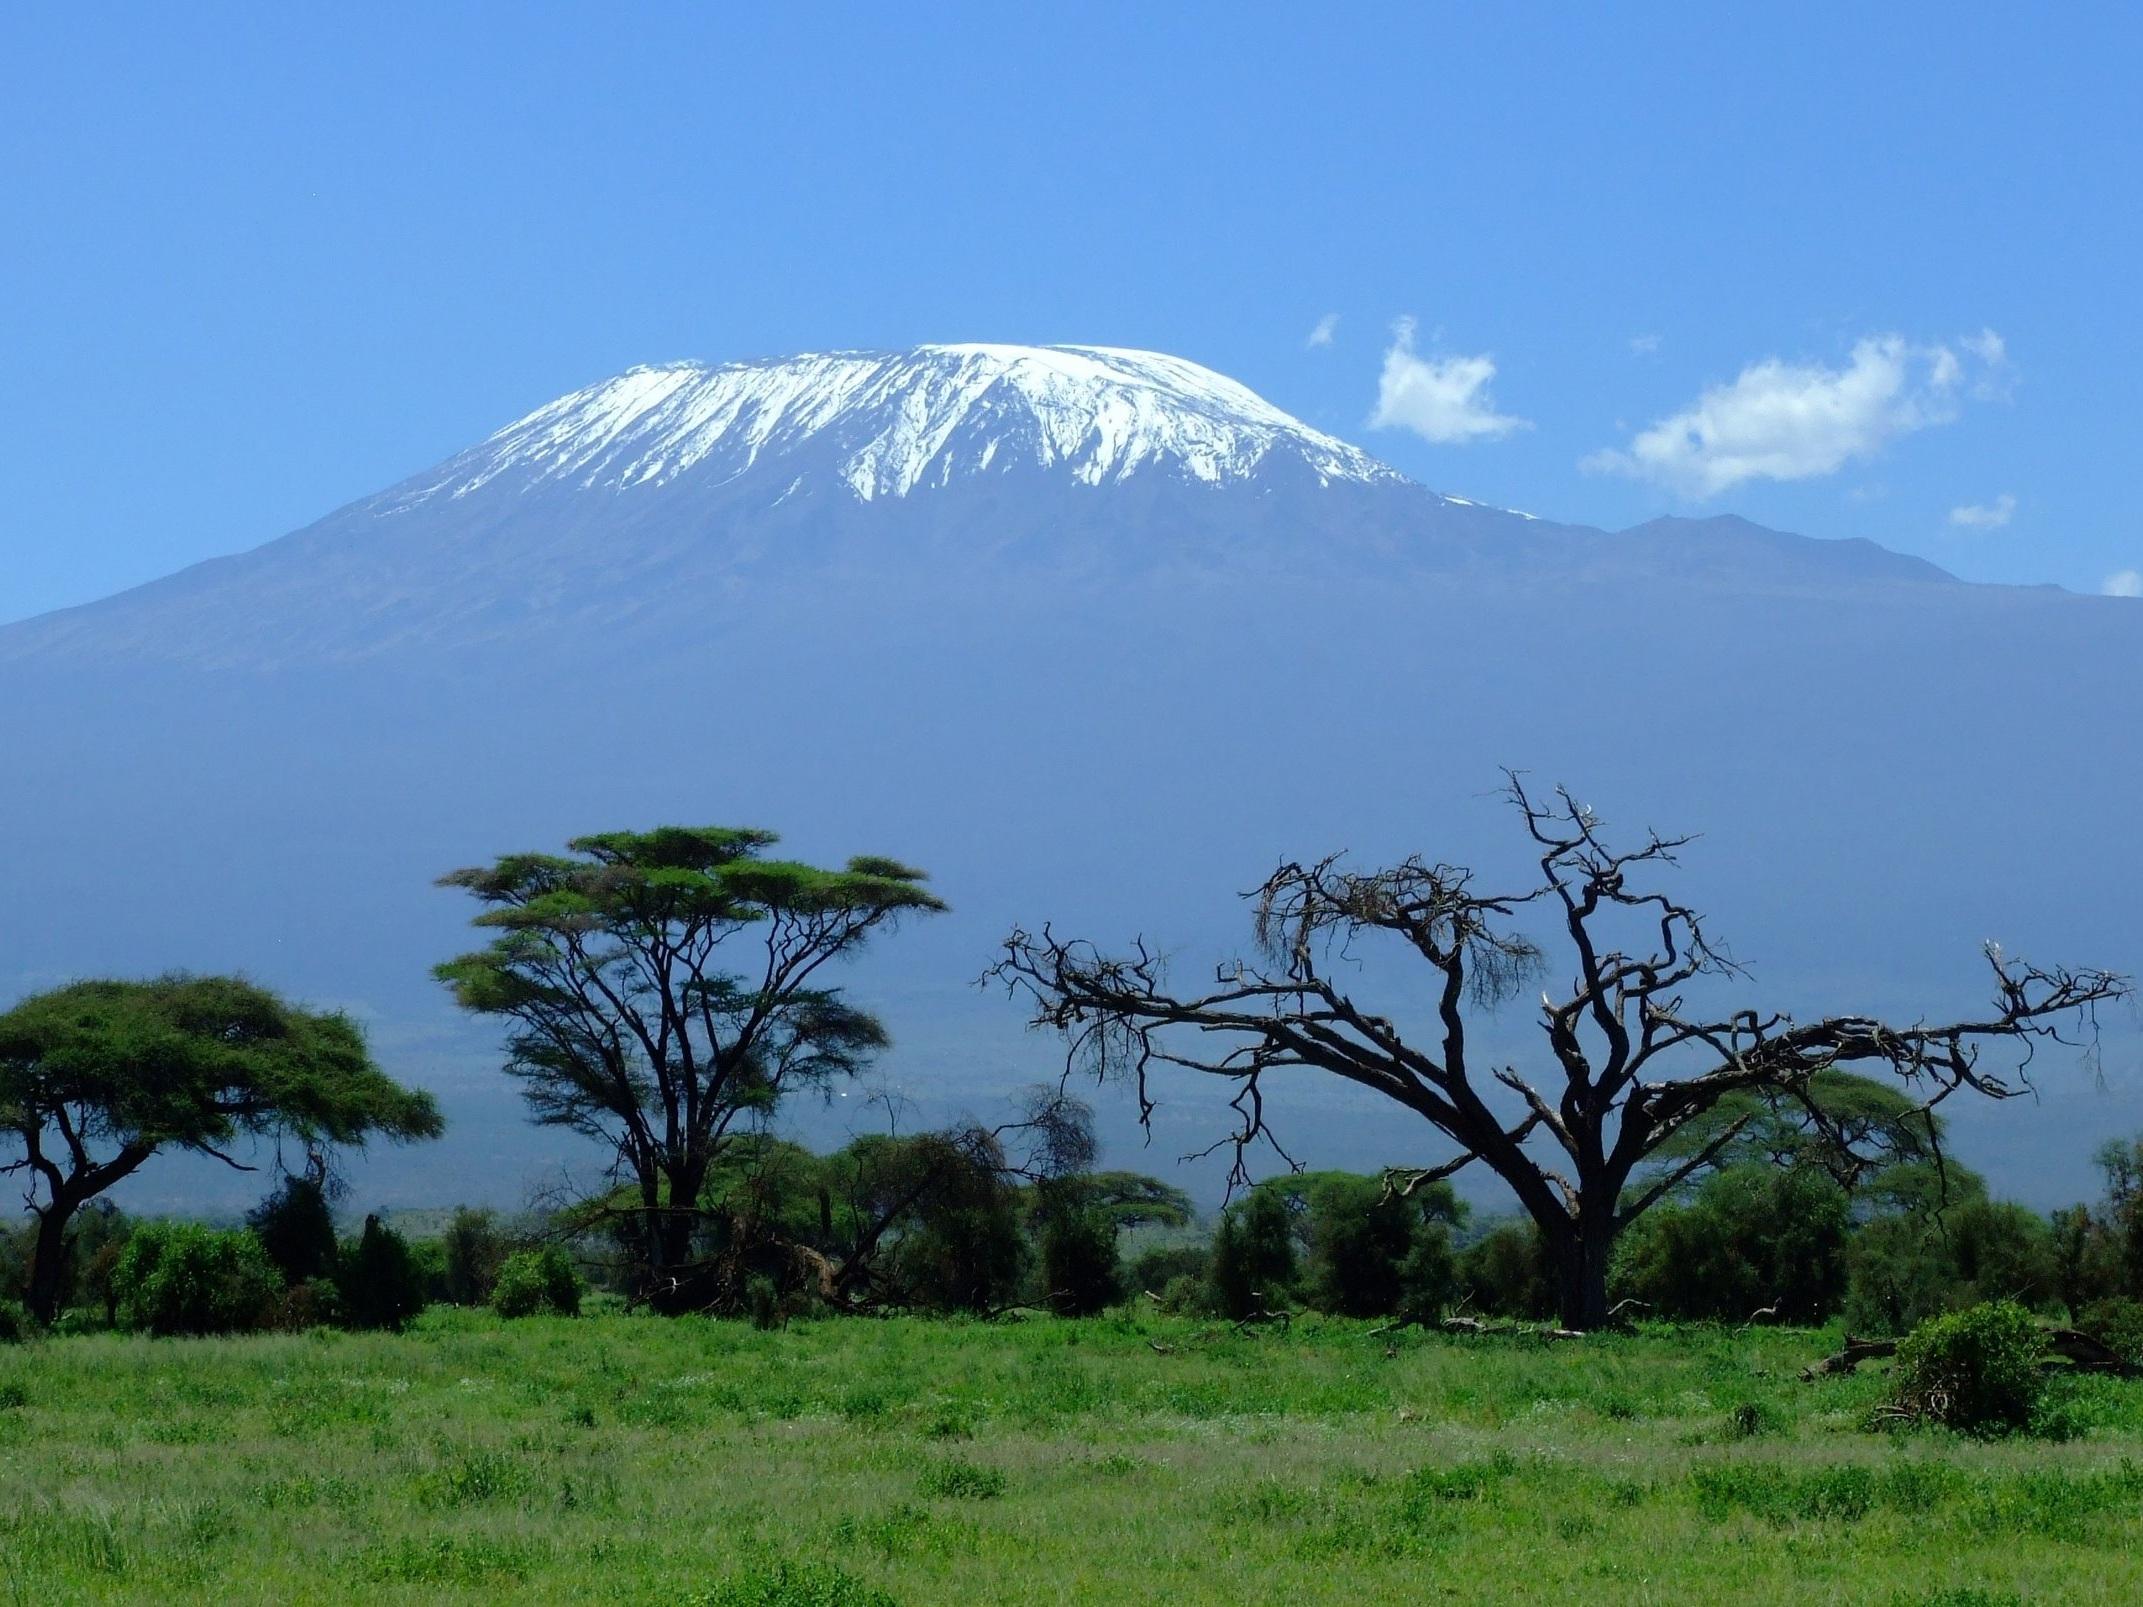 kilimanjaro-1025146.jpg